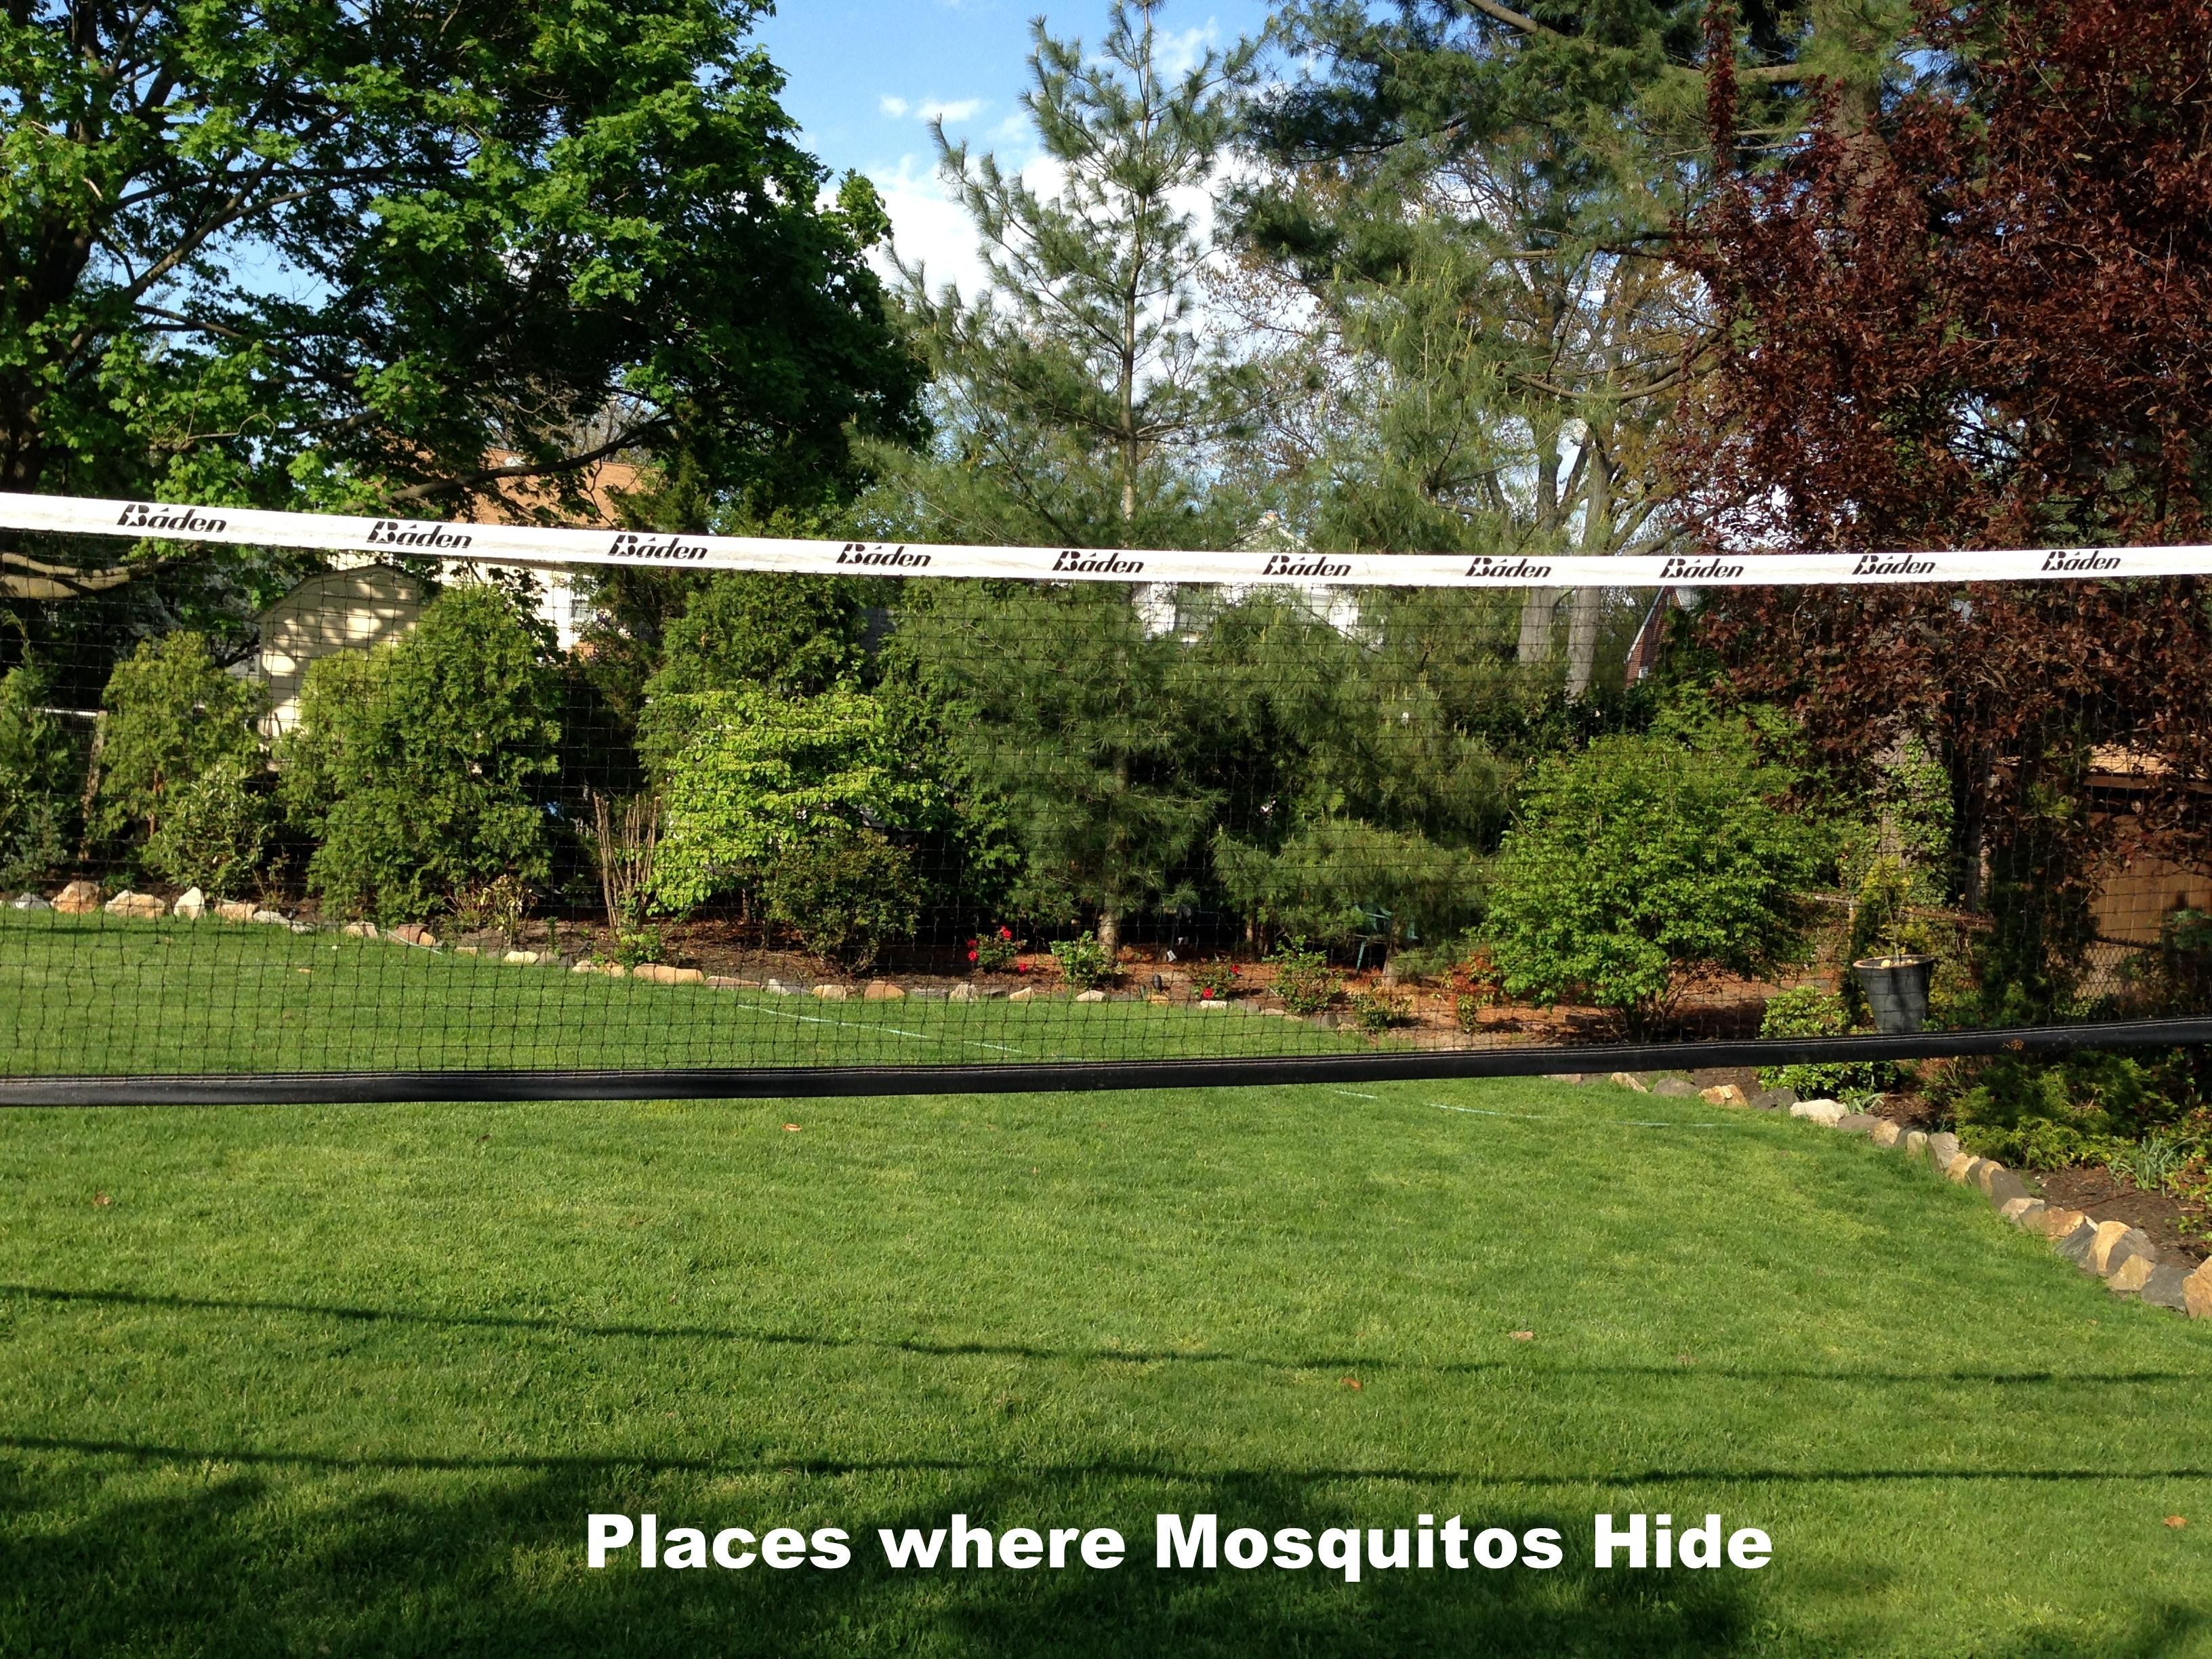 Mosquito Breeding places2-1.jpg